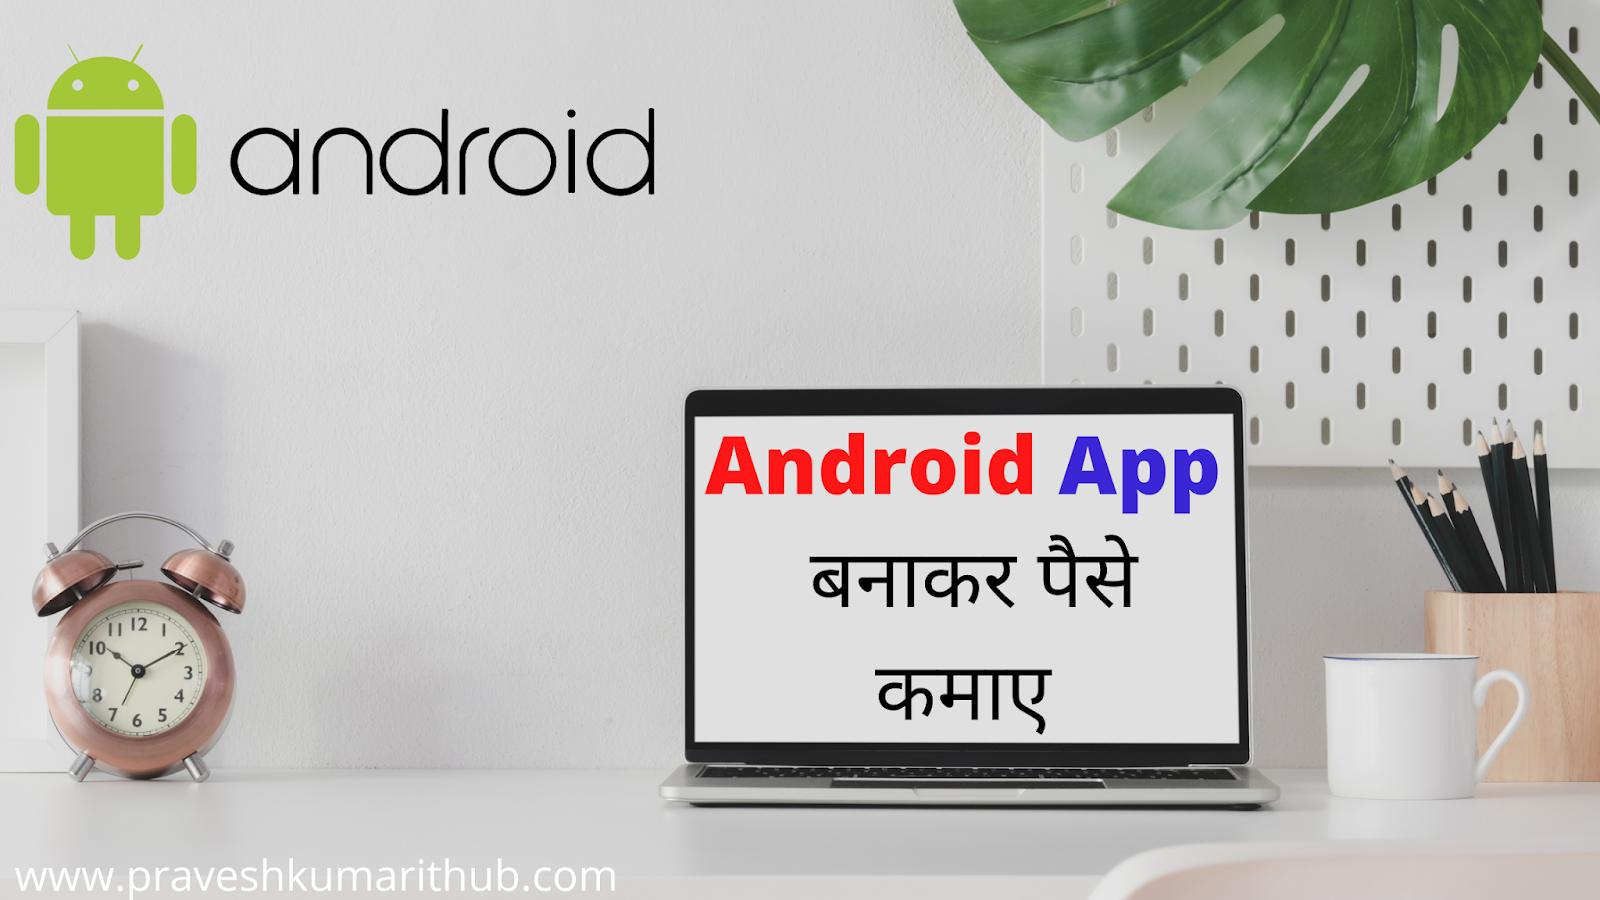 Android App बनाकर पैसे कमाए